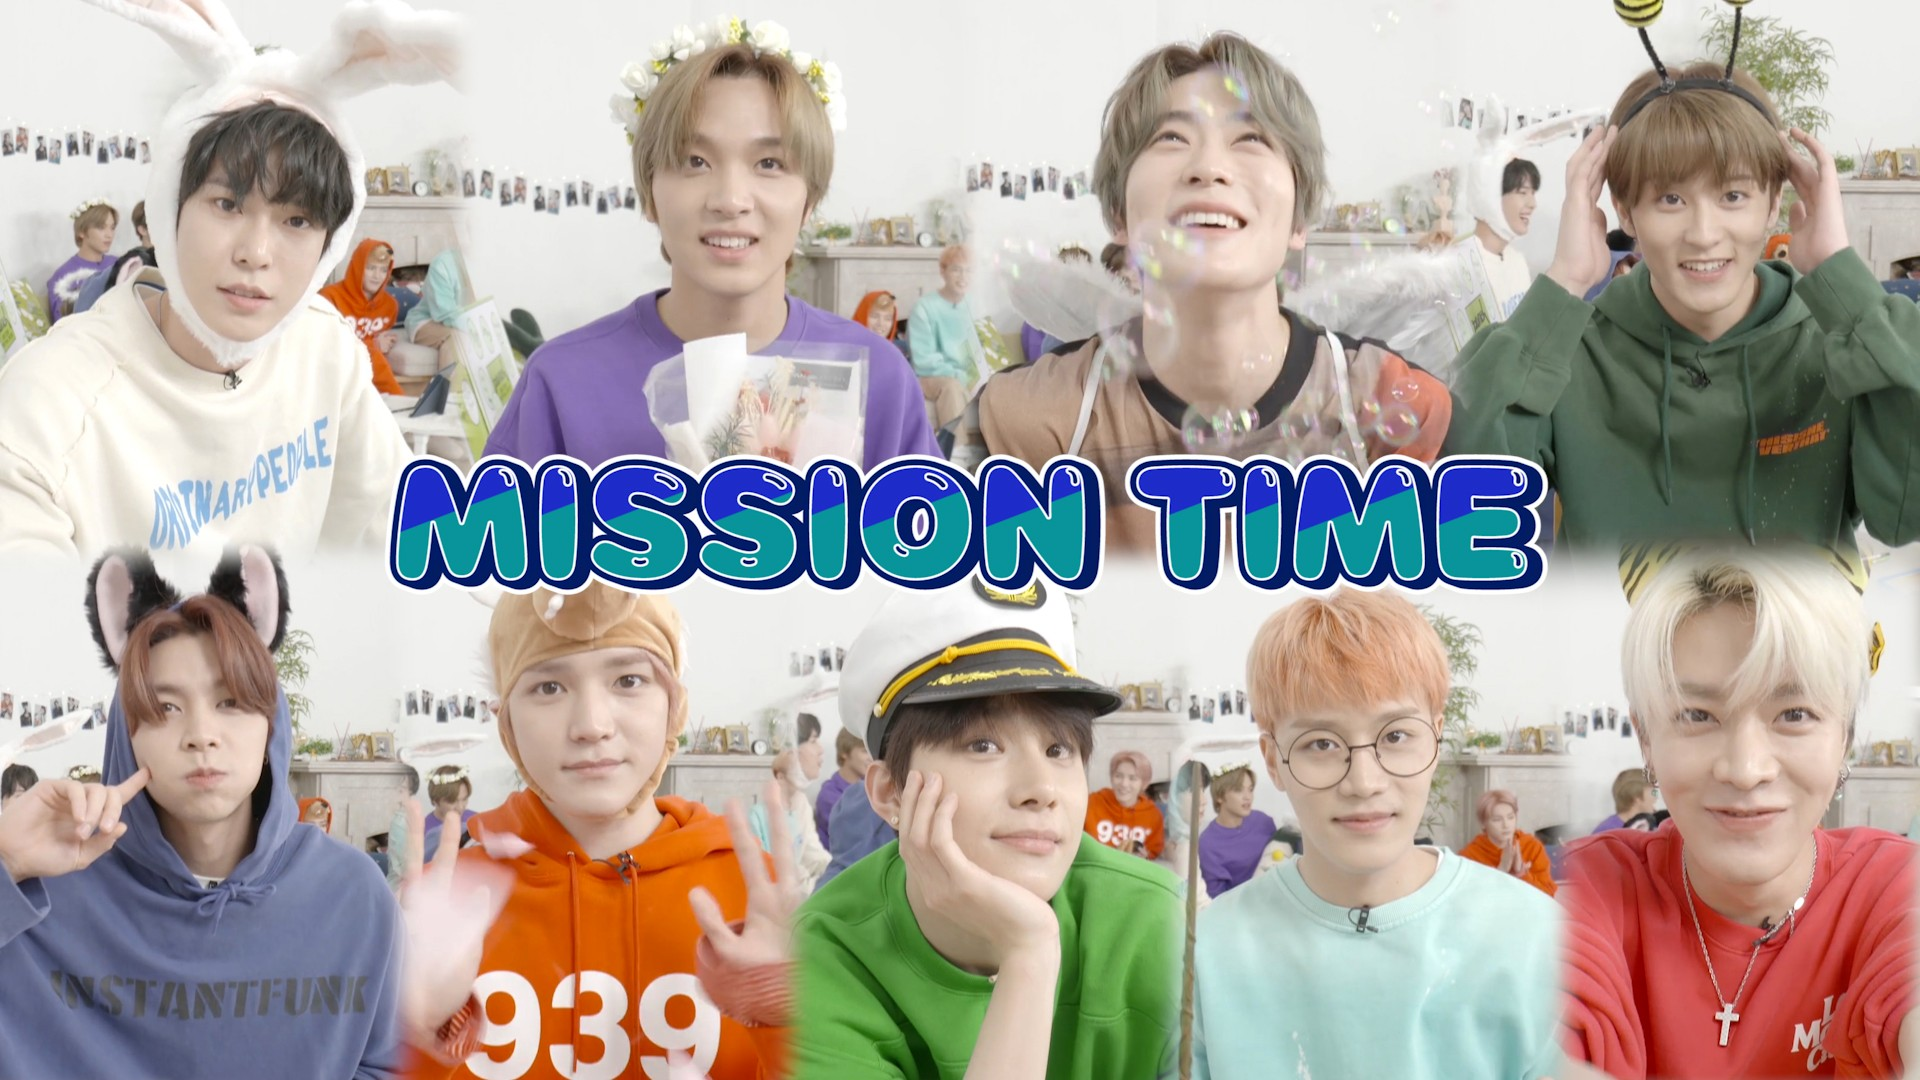 [NCT] (펀)하고 (치)명적인 미션타임도 완벽하게 컴플리트!🥊👍 (NCT doing comeback mission time)